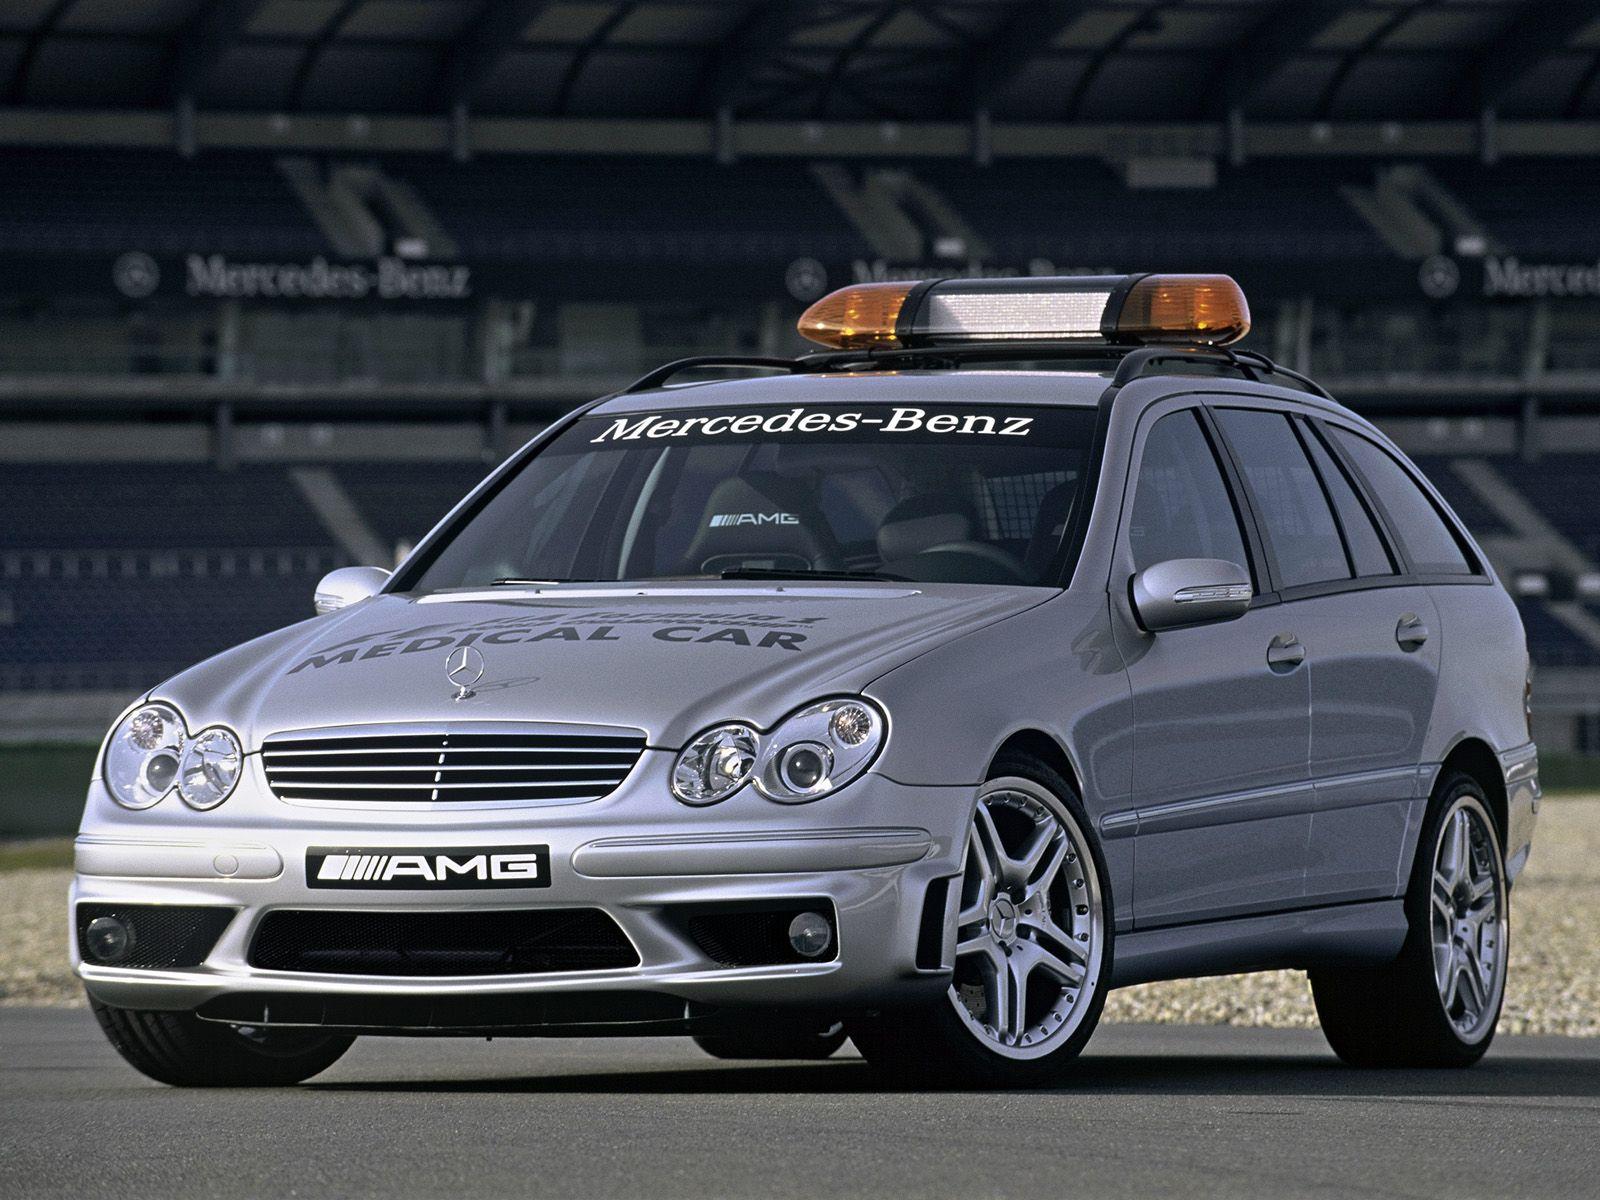 Amg mercedes benz c 55 estate f1 medical car